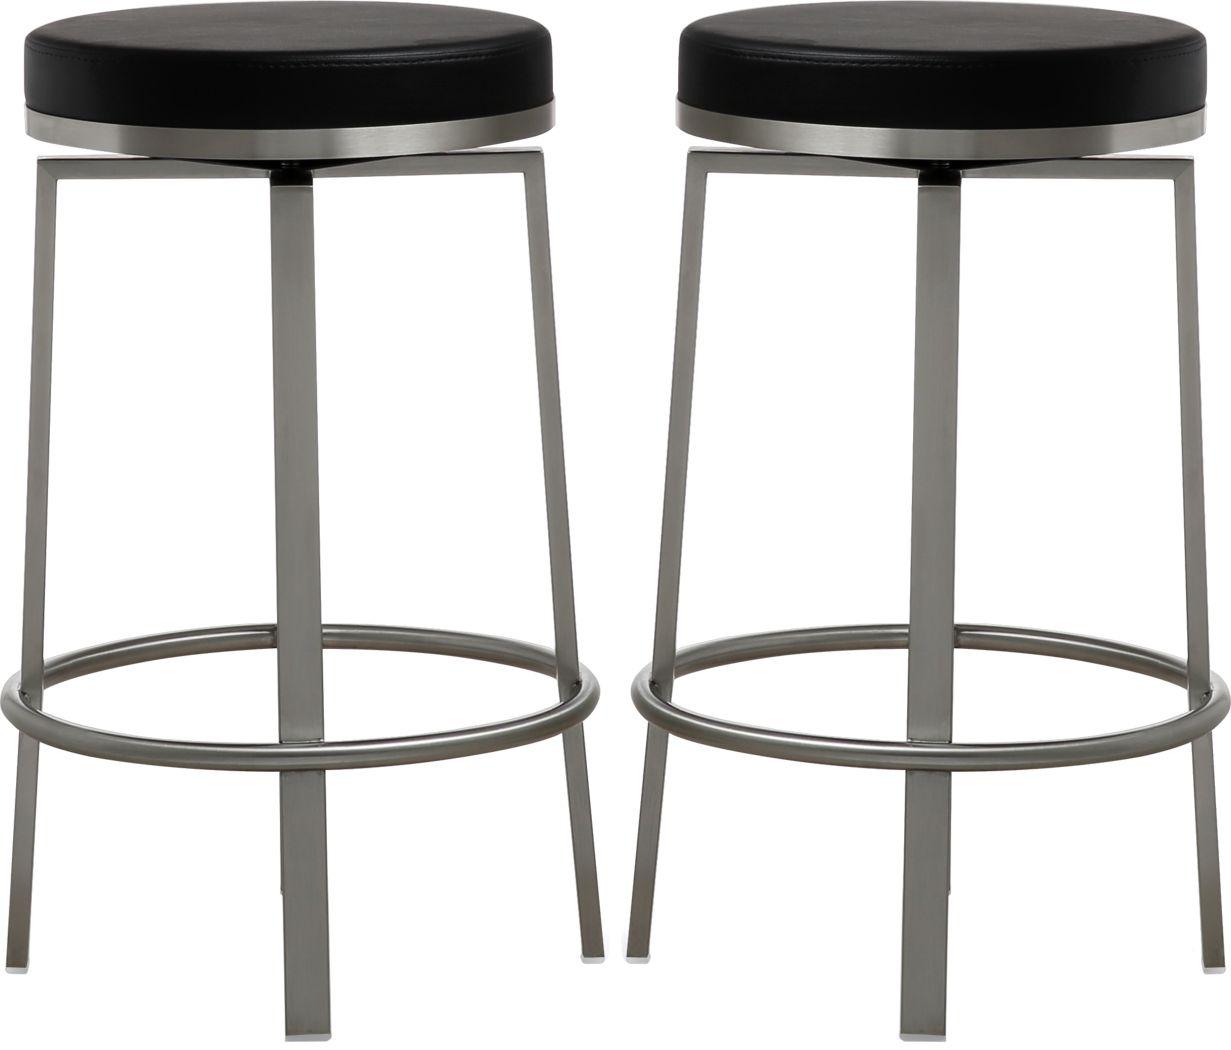 Rourke Black Counter Height Swivel Stools (Set of 2)